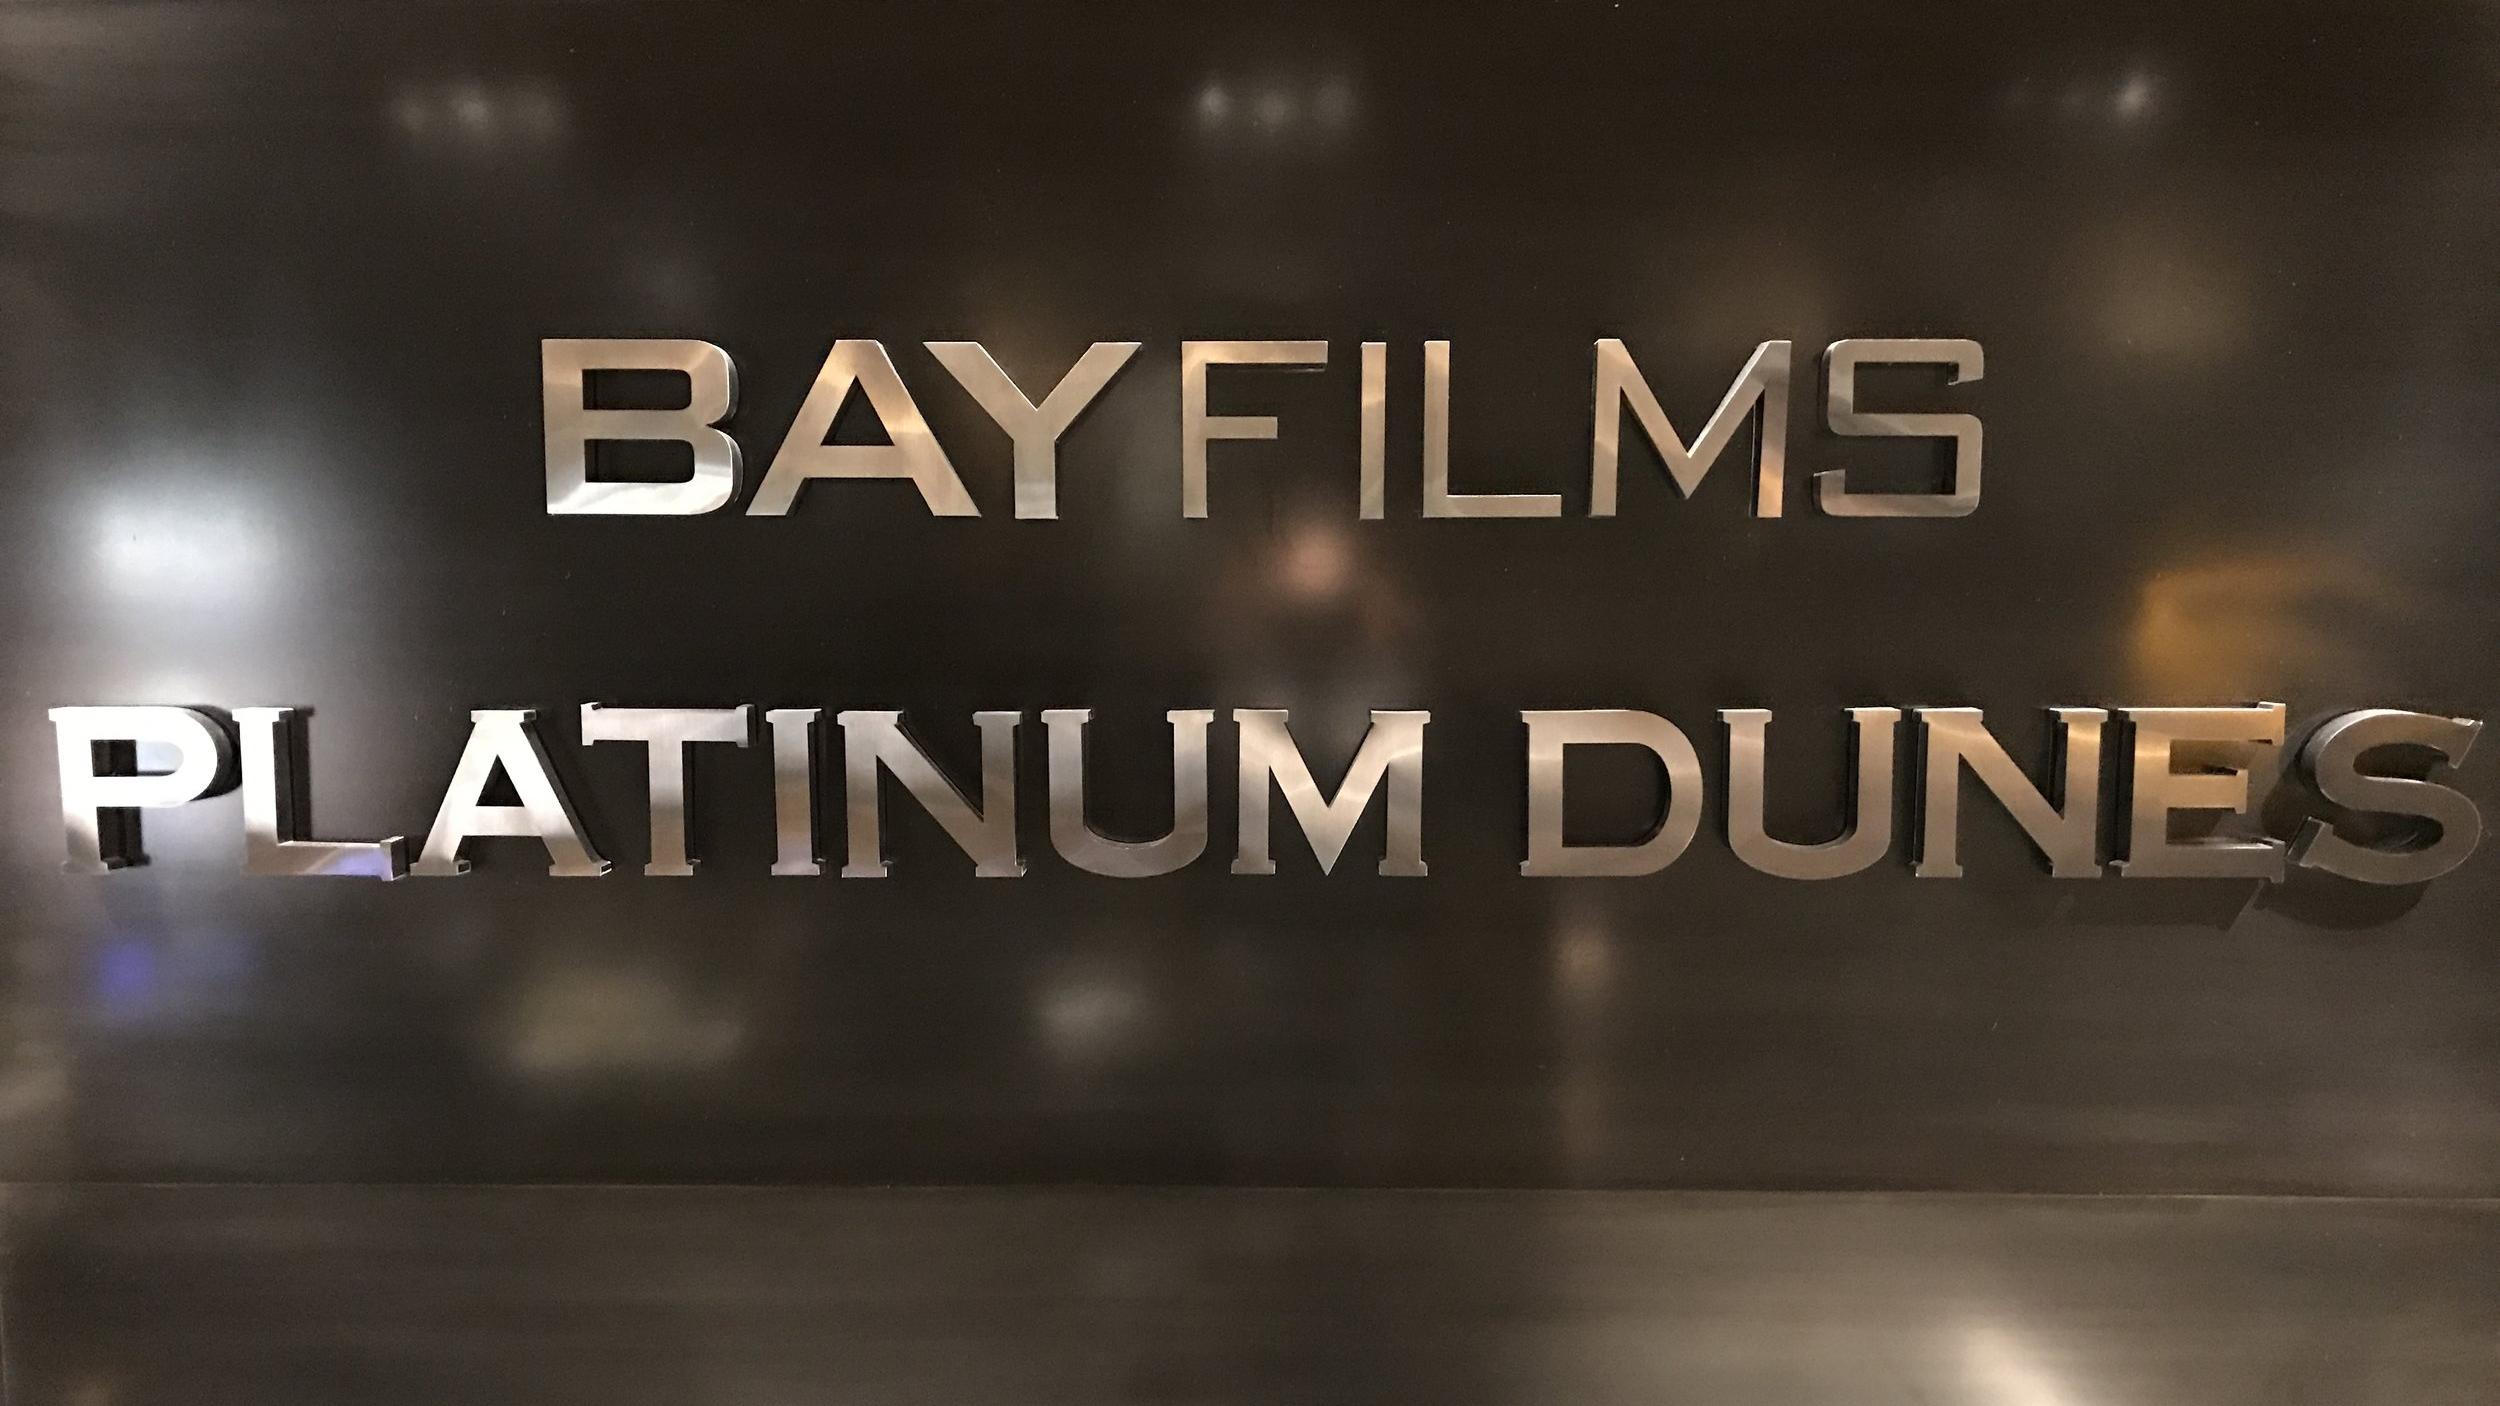 BAY FILMS, PLATINUM DUNES OFFICES